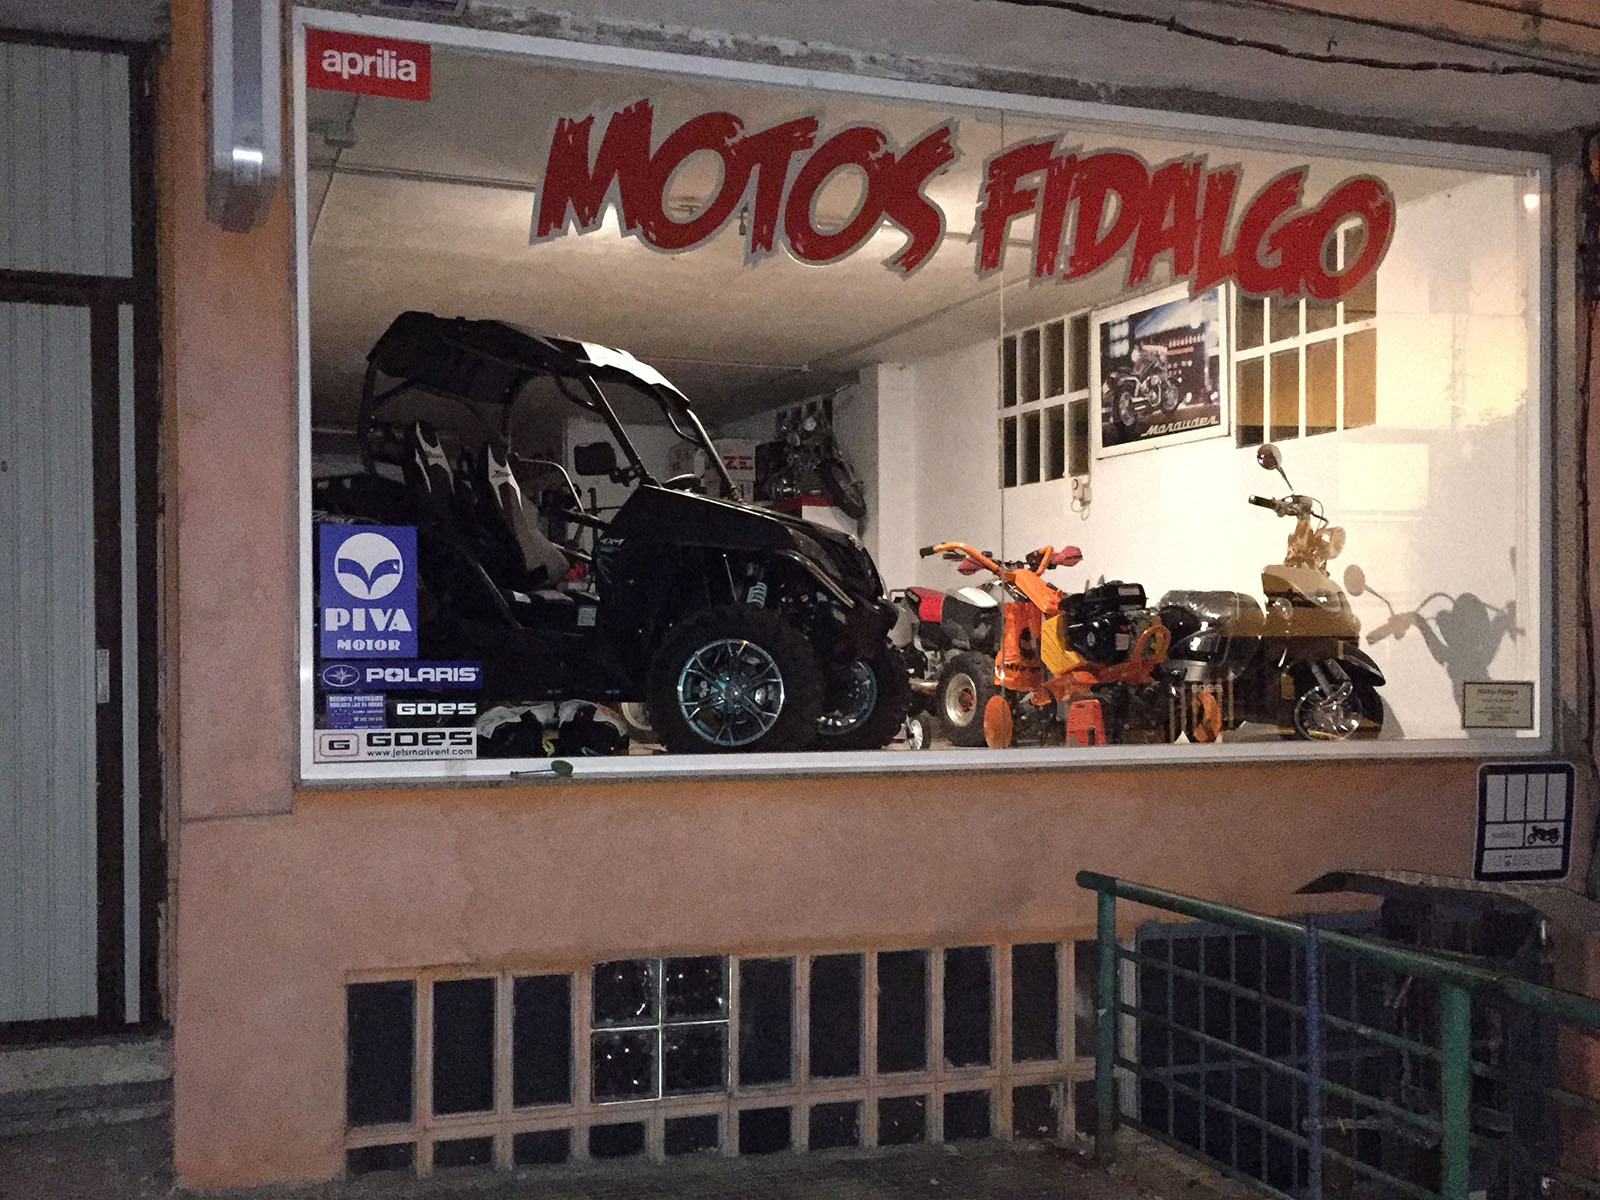 Tienda Motos Fidalgo - bembibre